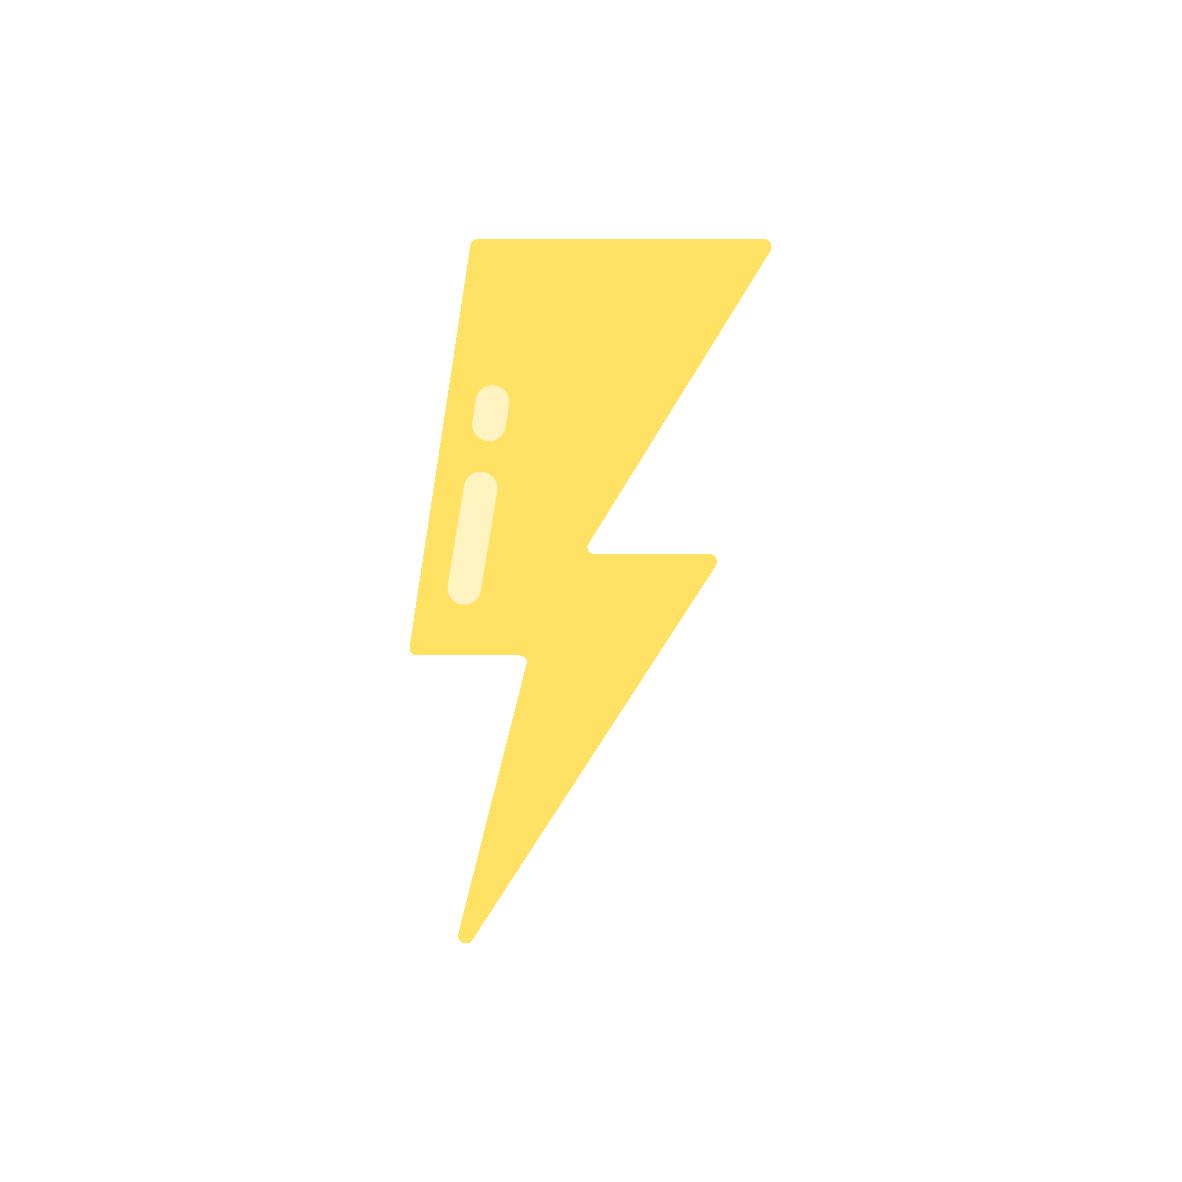 Lightning bolt pictogram